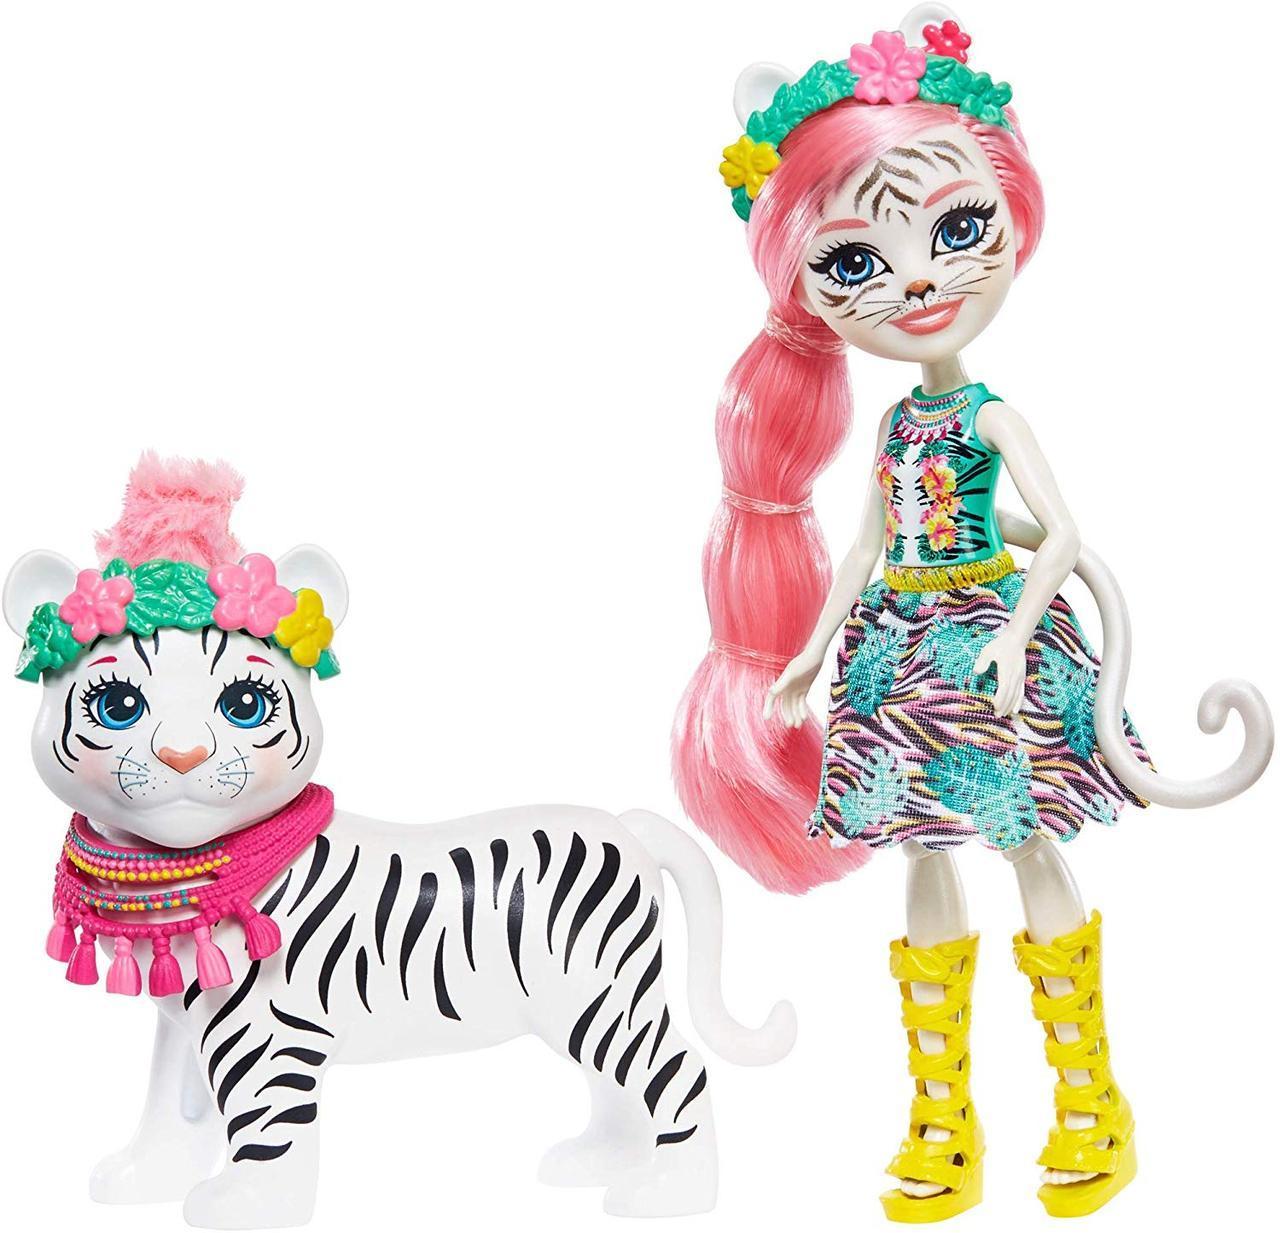 Энчантималс Тэдли Тайгер кукла с большой зверюшкой Enchantimals Tadley Tiger